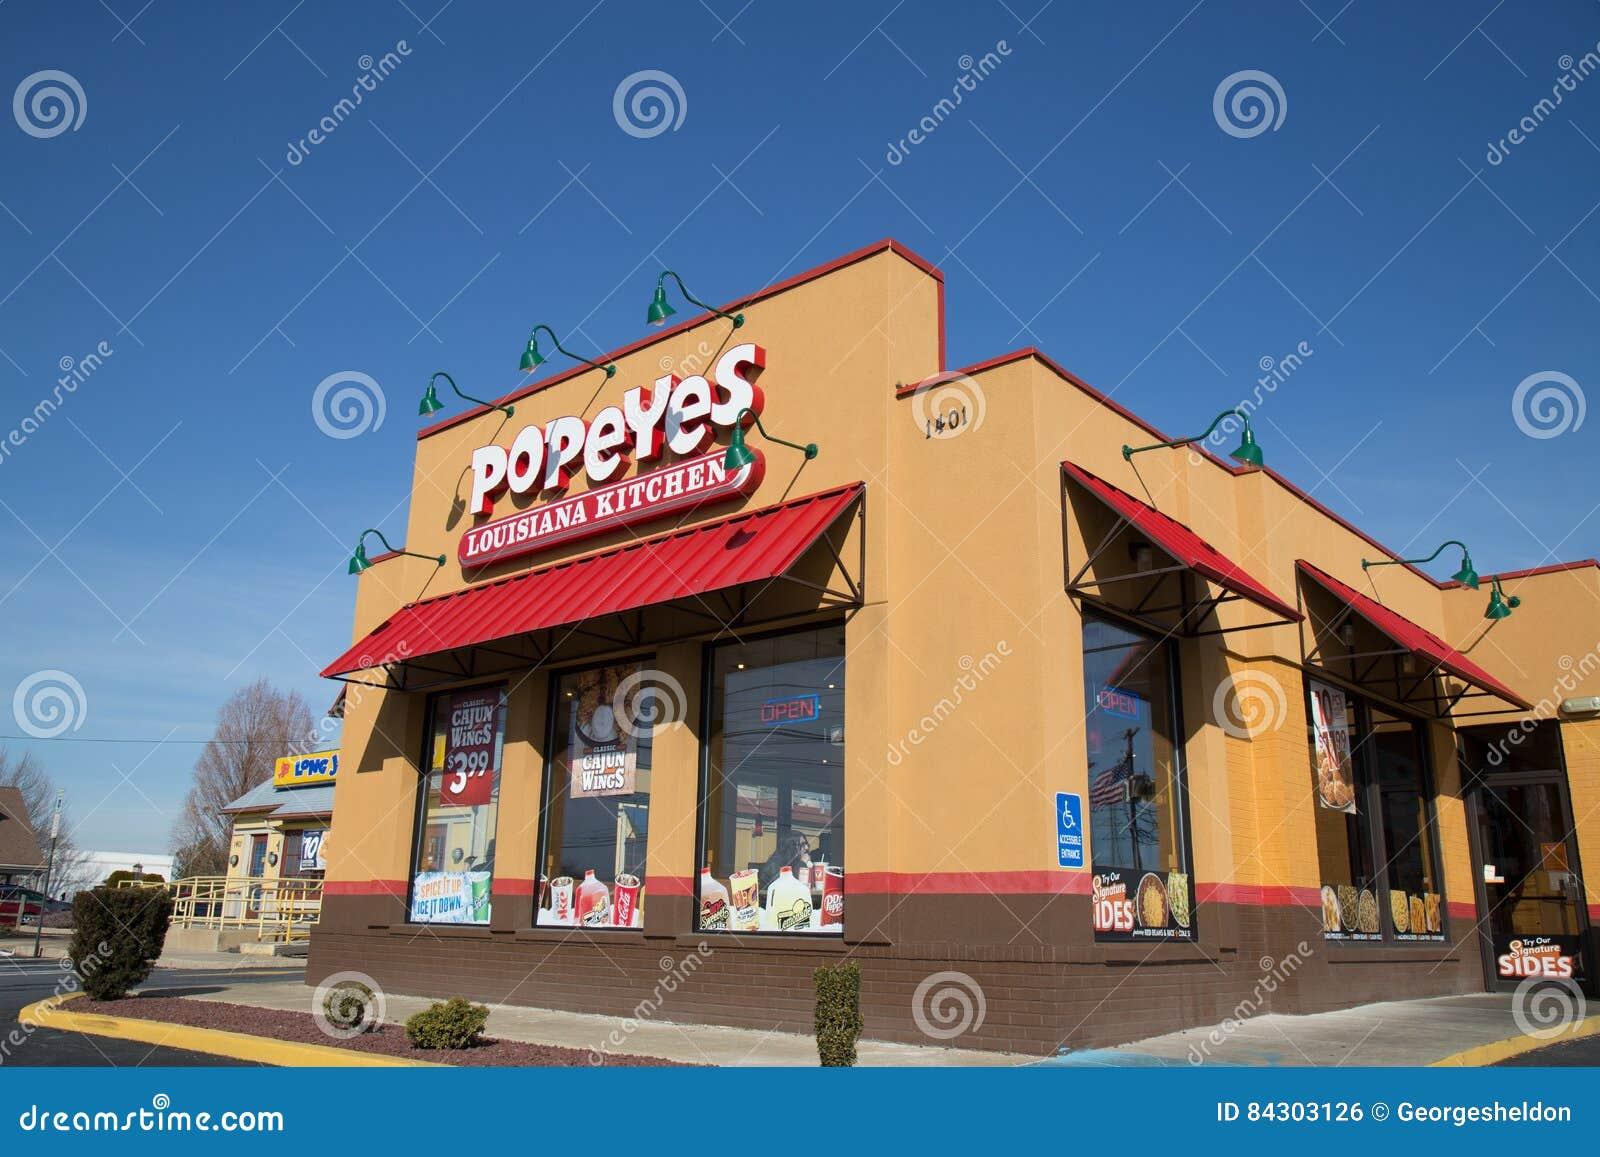 Exterior Of Popeyes Louisiana Kitchen Restaurant Location Editorial Photo Image Of Popeyes Franchise 84303126